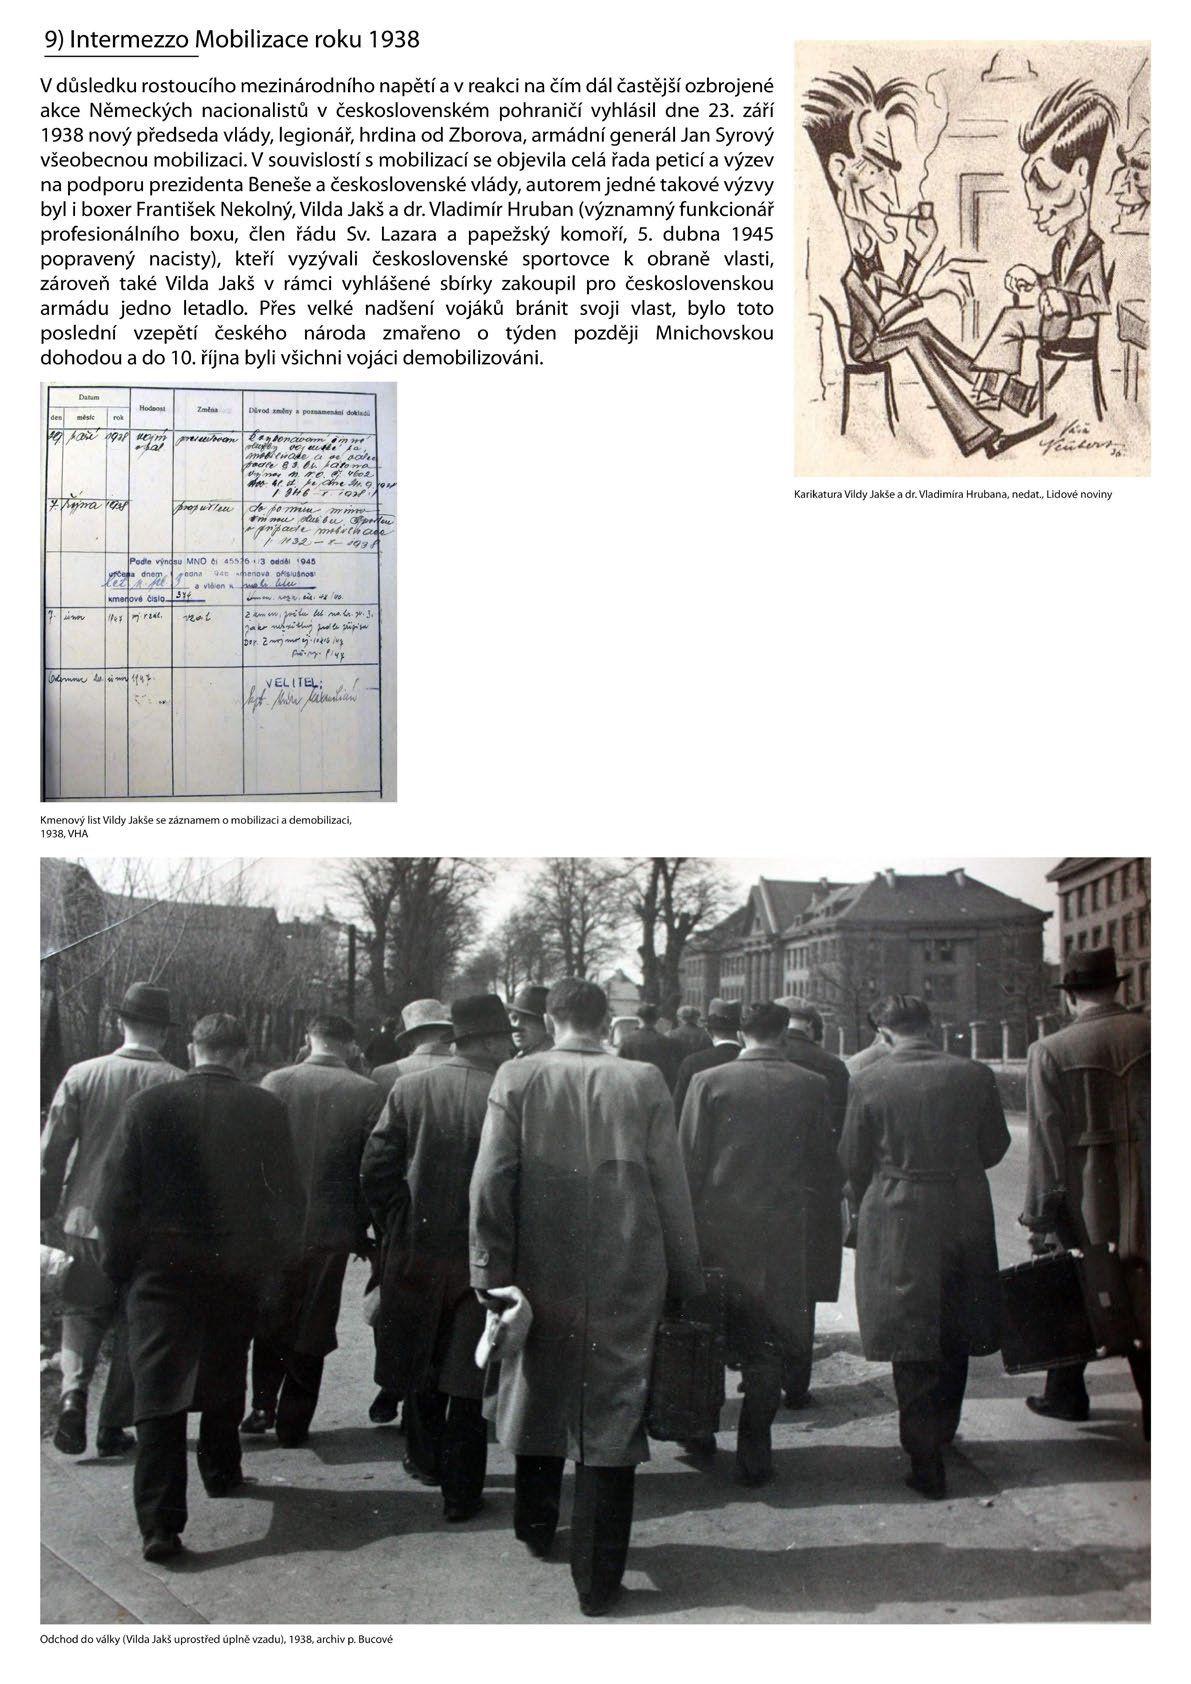 Mobilizace roku 1938